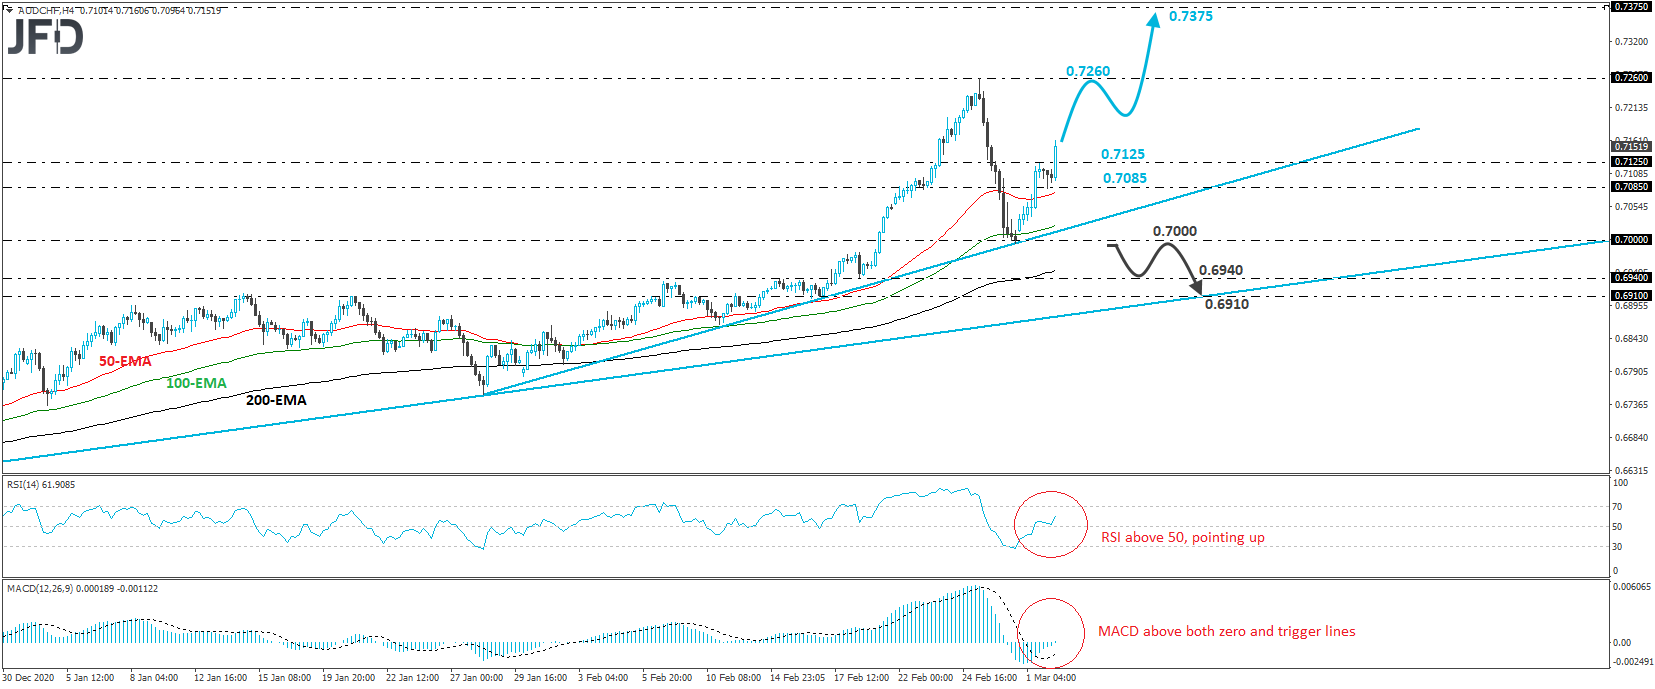 AUD/CHF 4-hour chart technical analysis